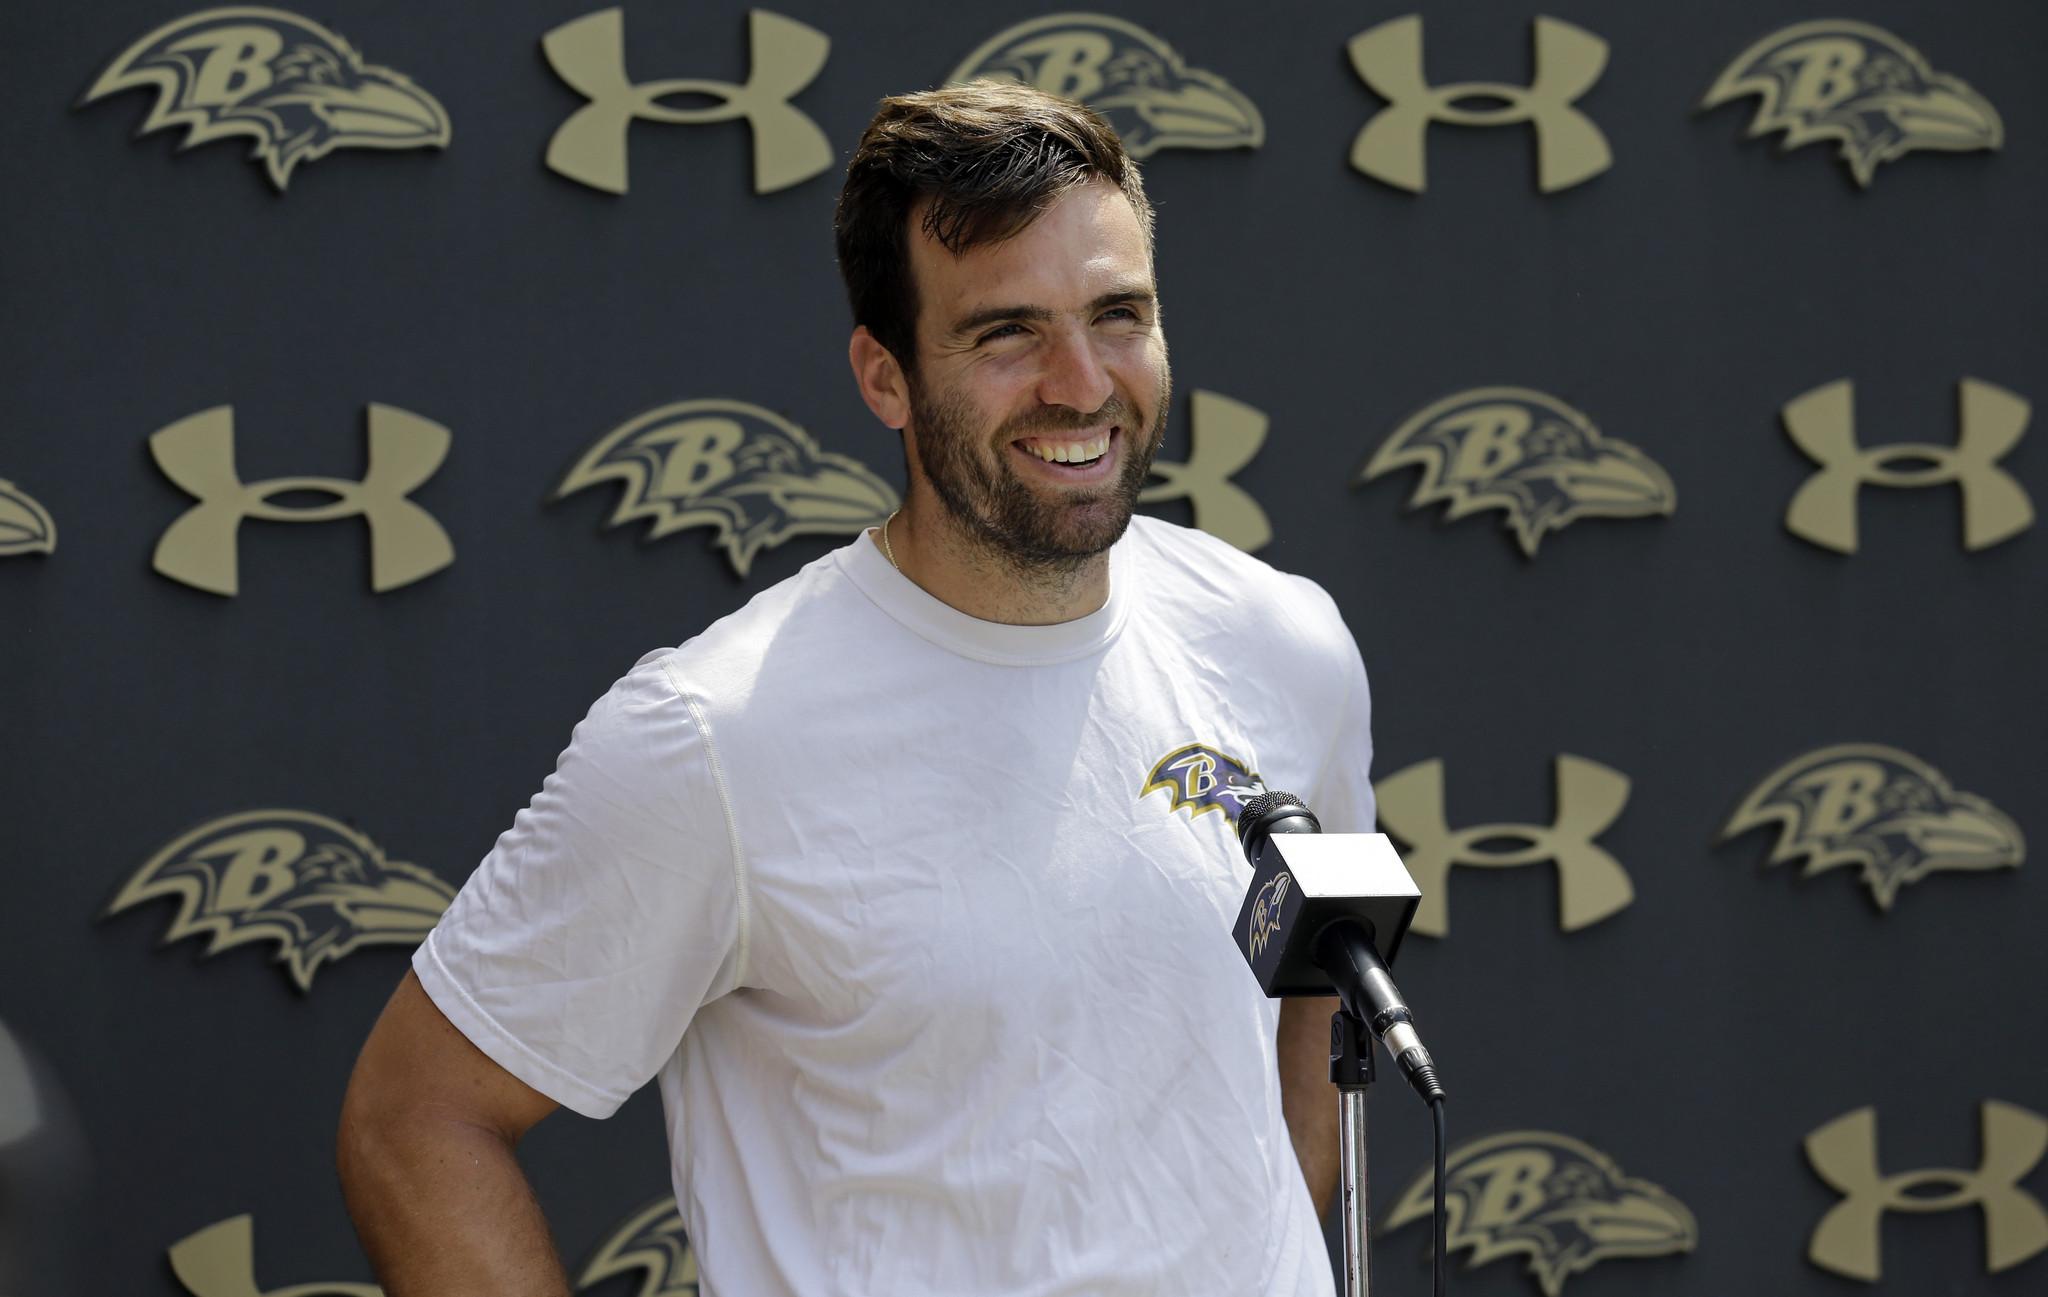 Ravens quarterback Joe Flacco not feeling his age, says he ...